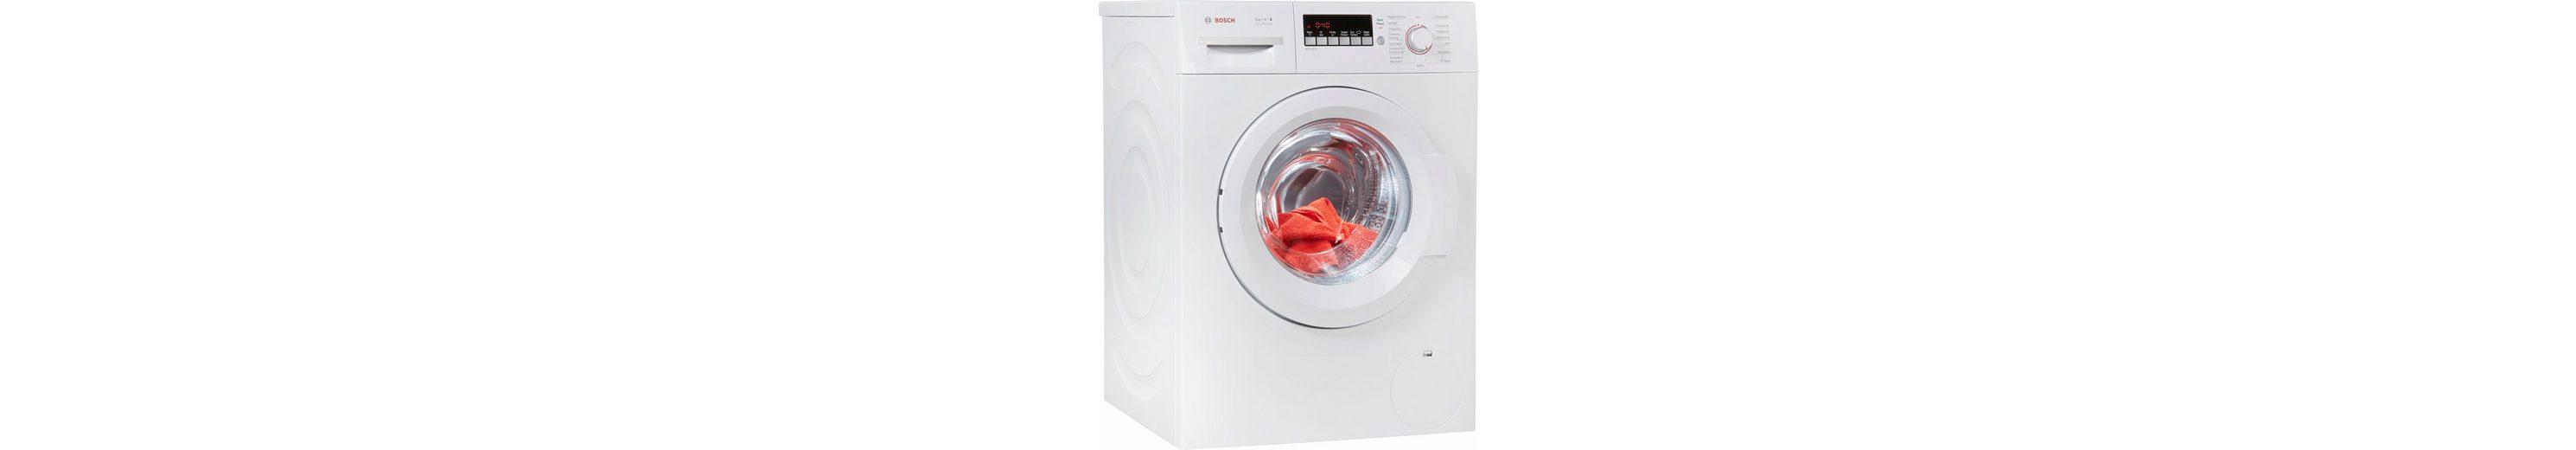 Haier waschmaschine anleitung